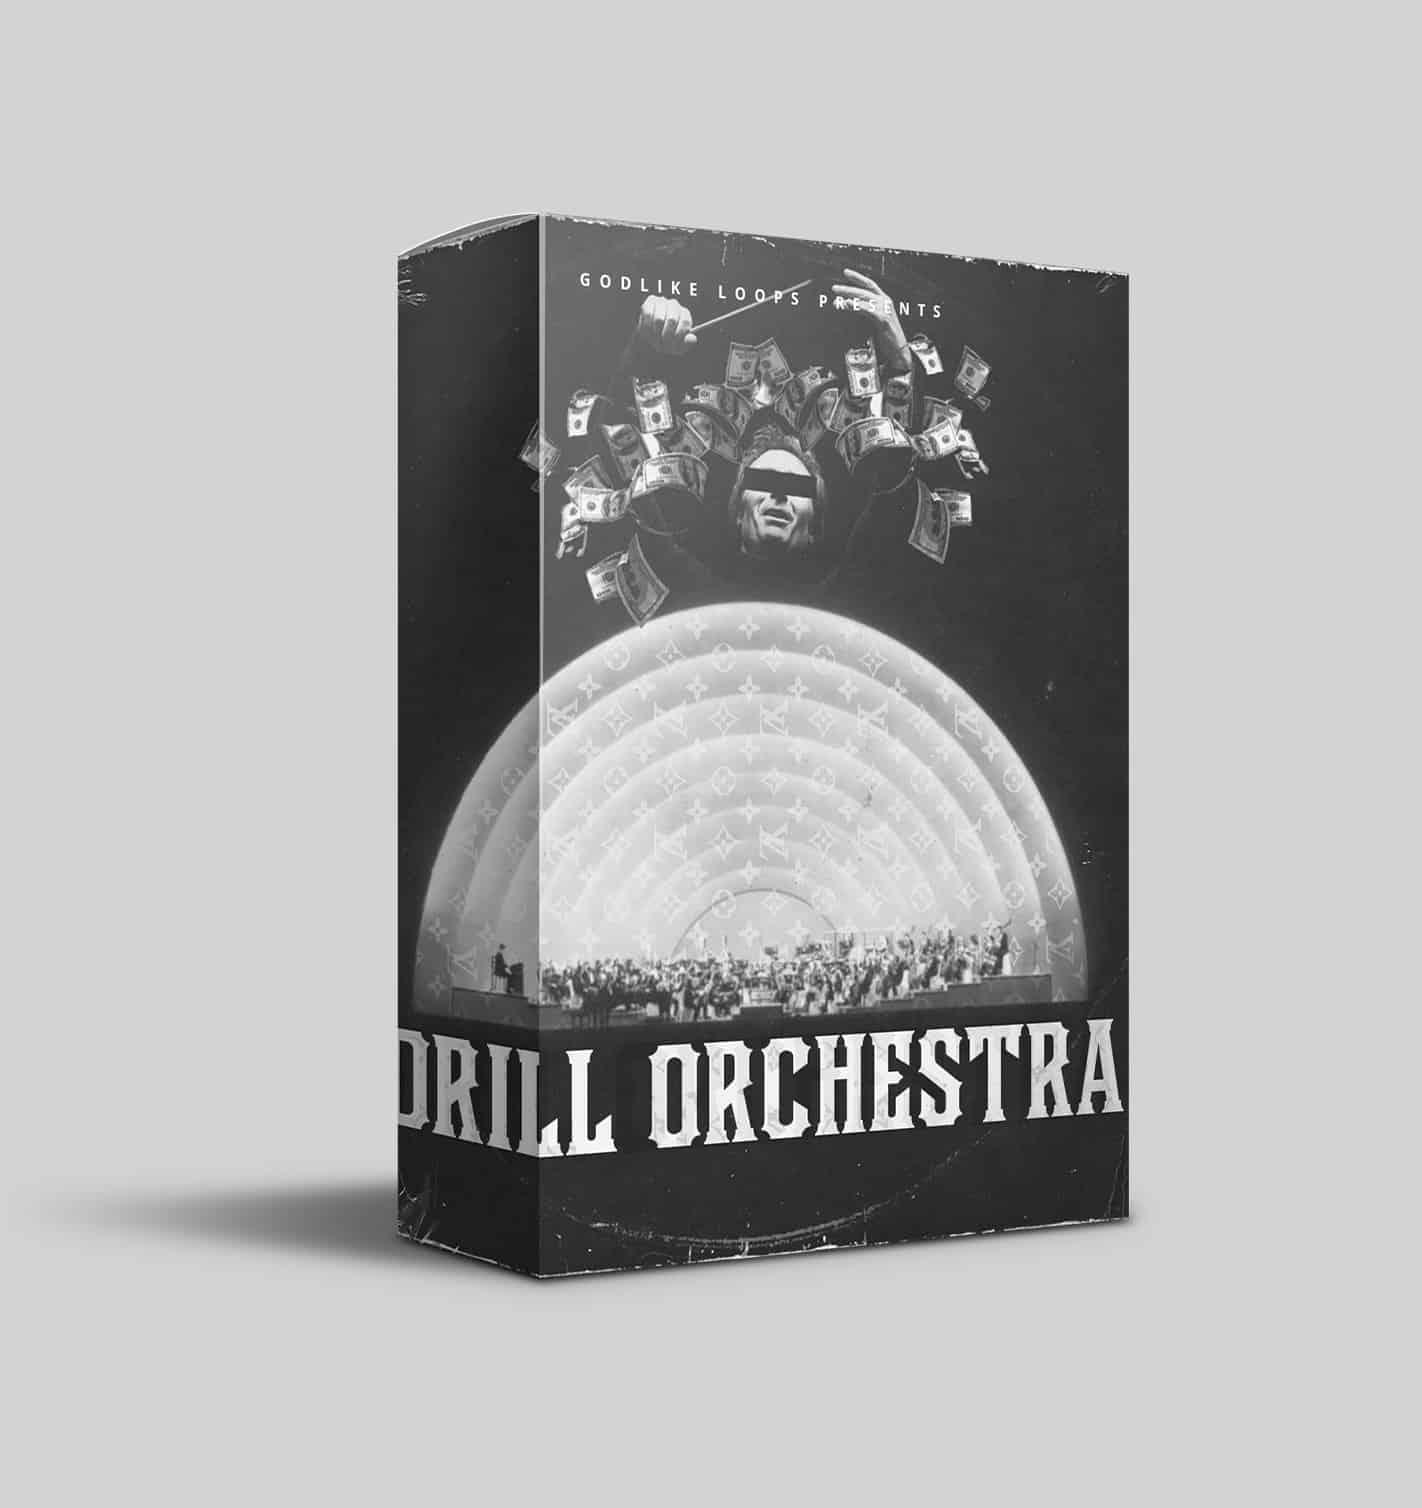 Godlike Loops - Drill Orchestra